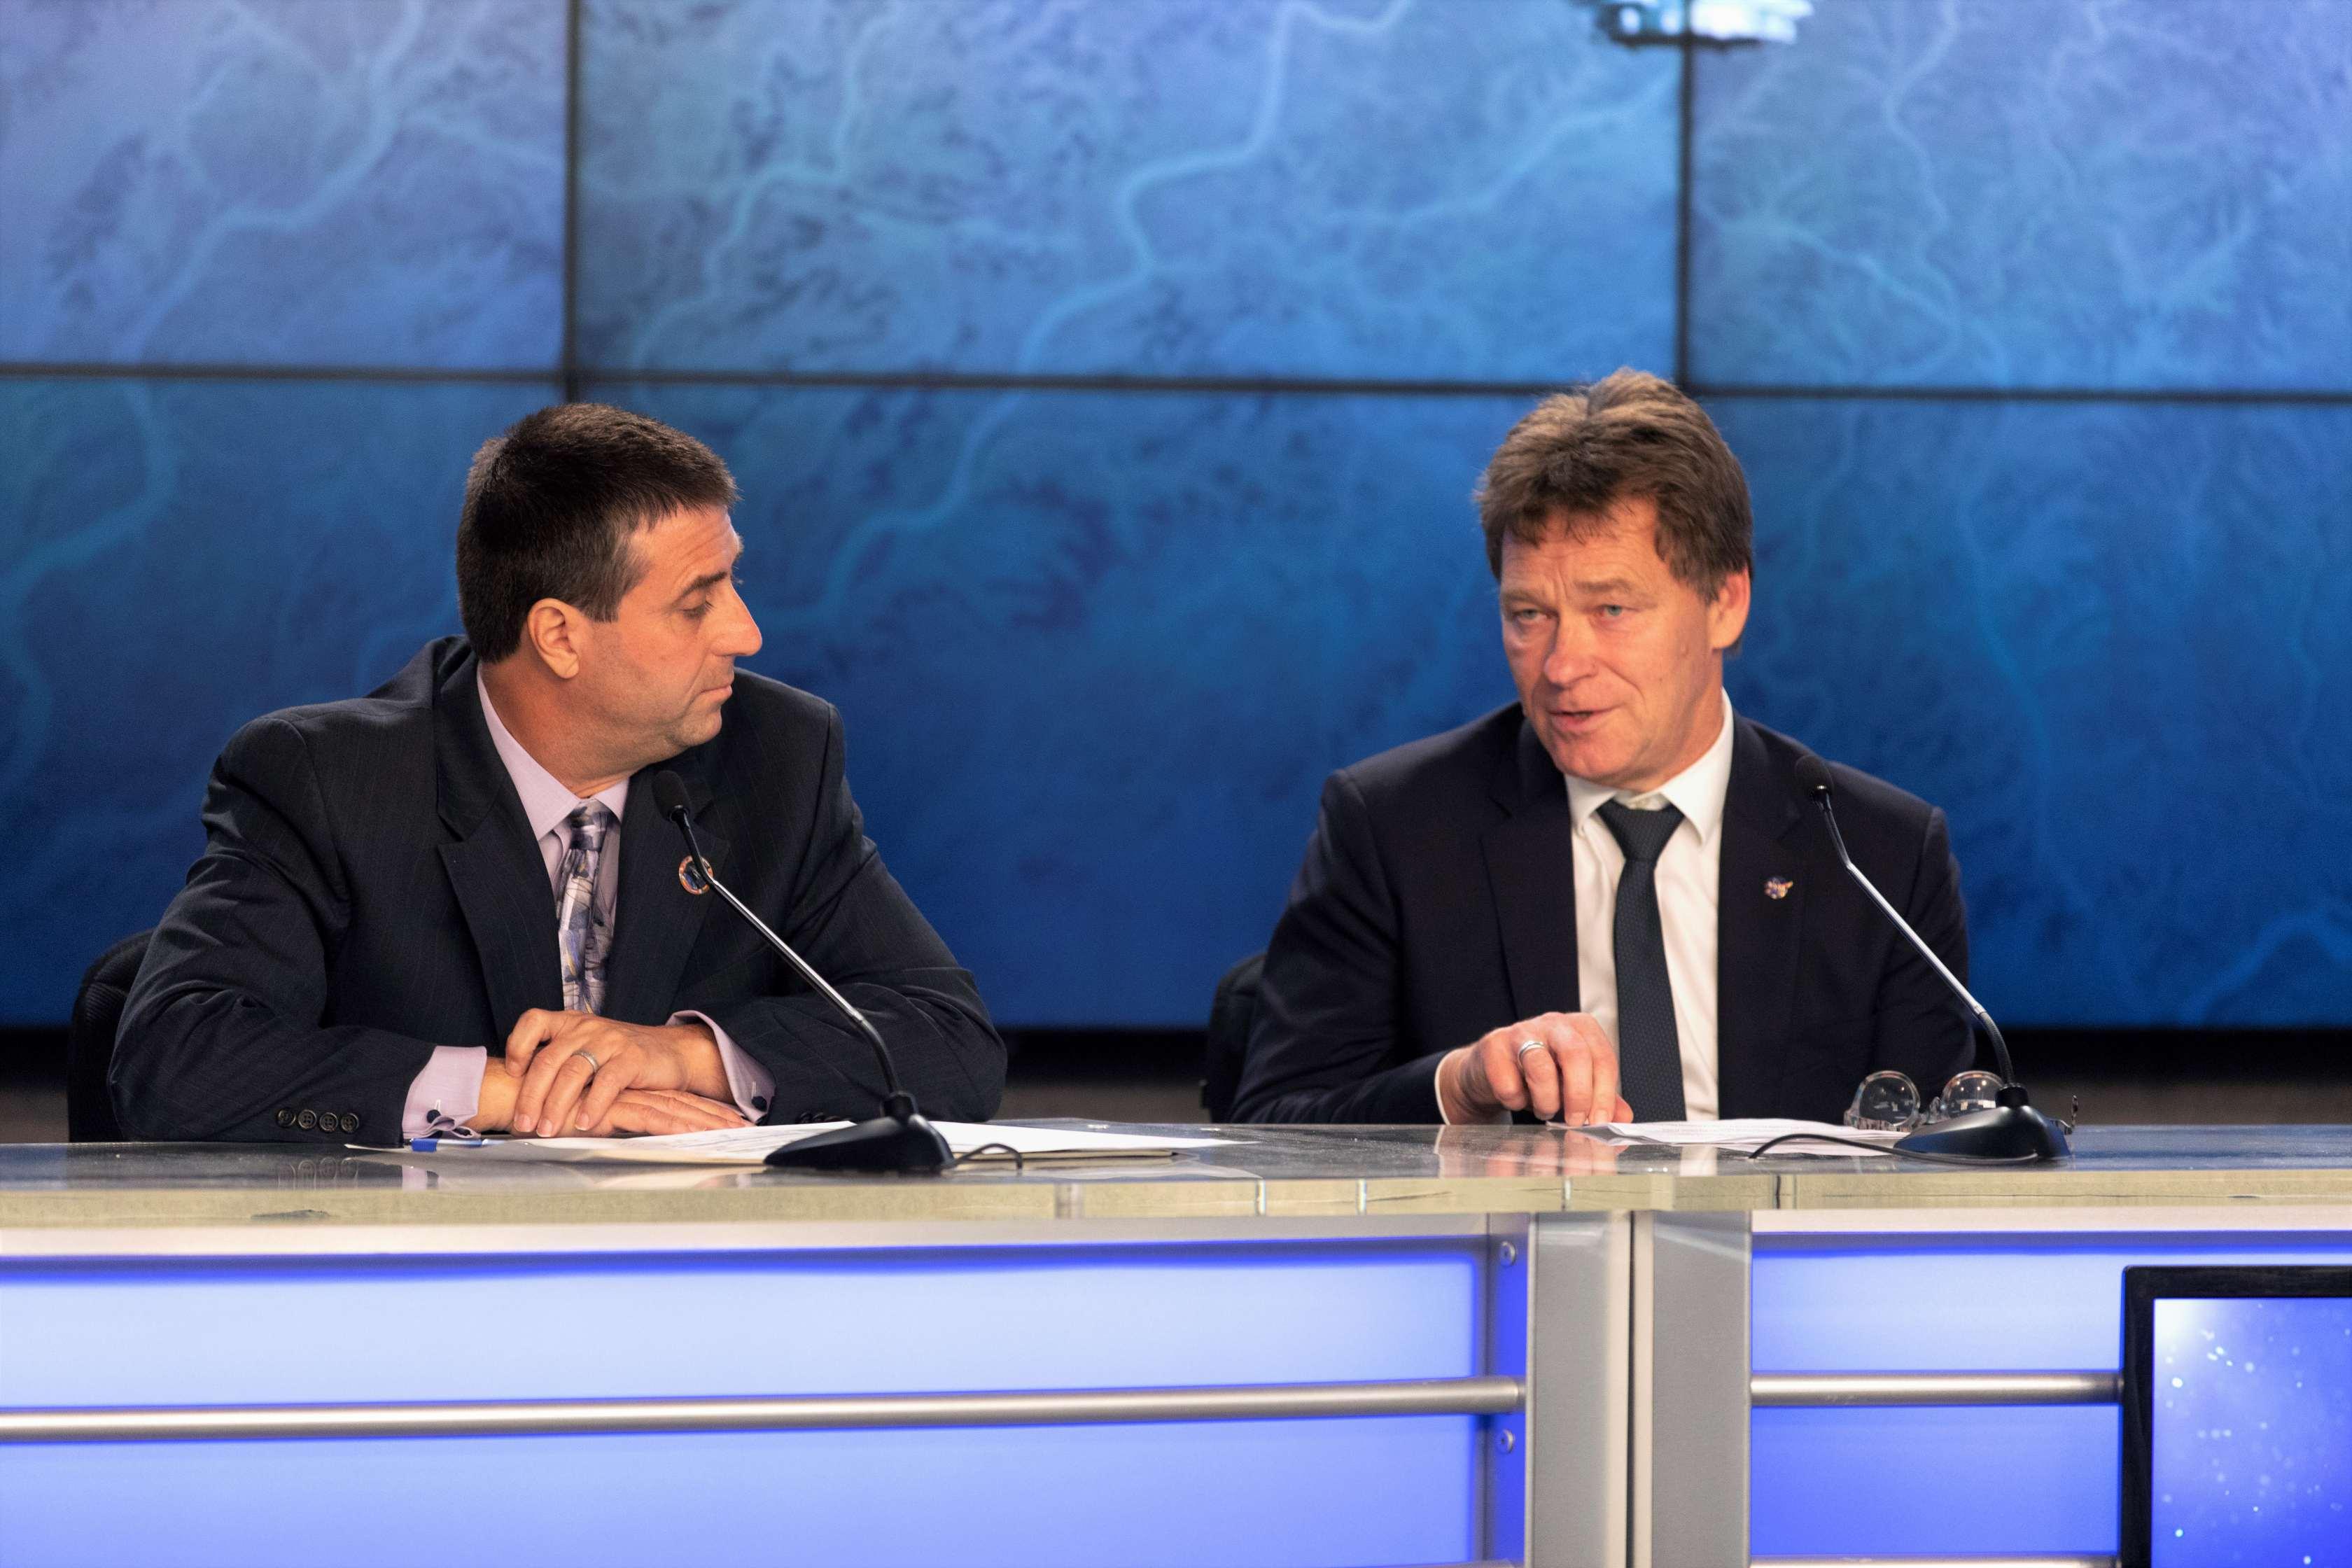 CRS-16 pre-launch conference Joel Montalbano & Hans Koenigsmann (NASA)